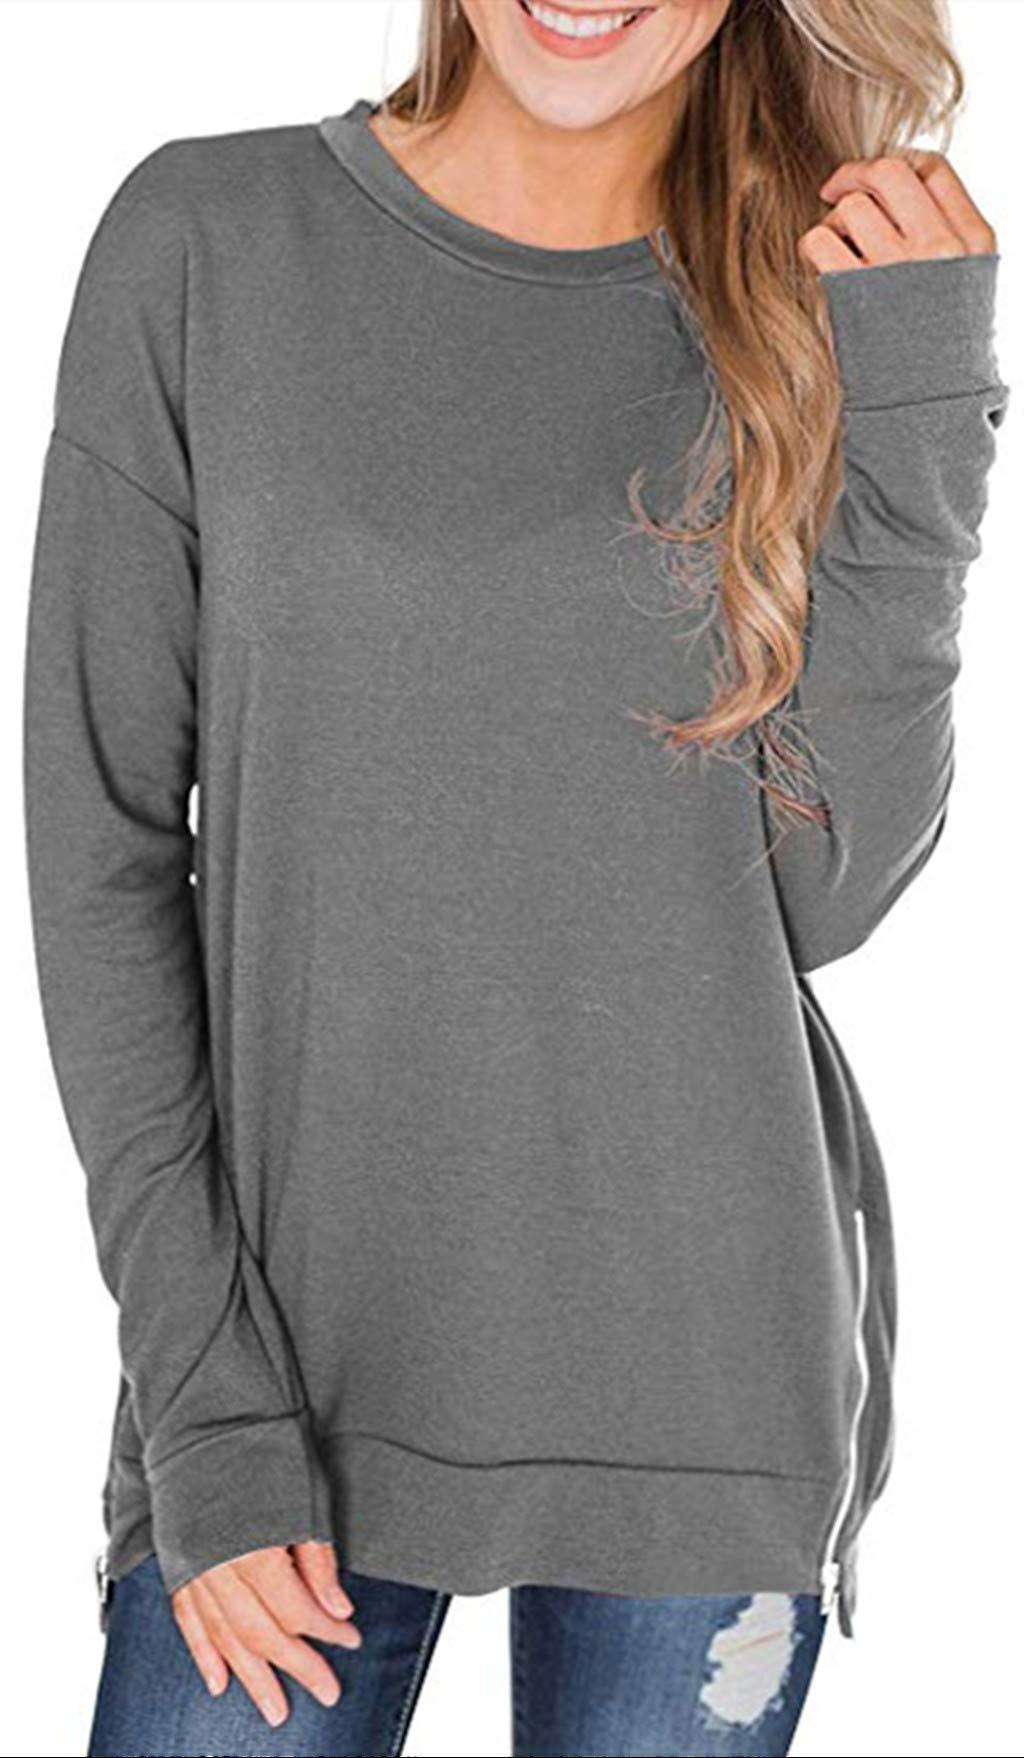 Kelove Womens Solid Color Crew Neck Long Sleeve Zipper Sweatshirt,Novelty Sweatshirts Women Gray by Kelove